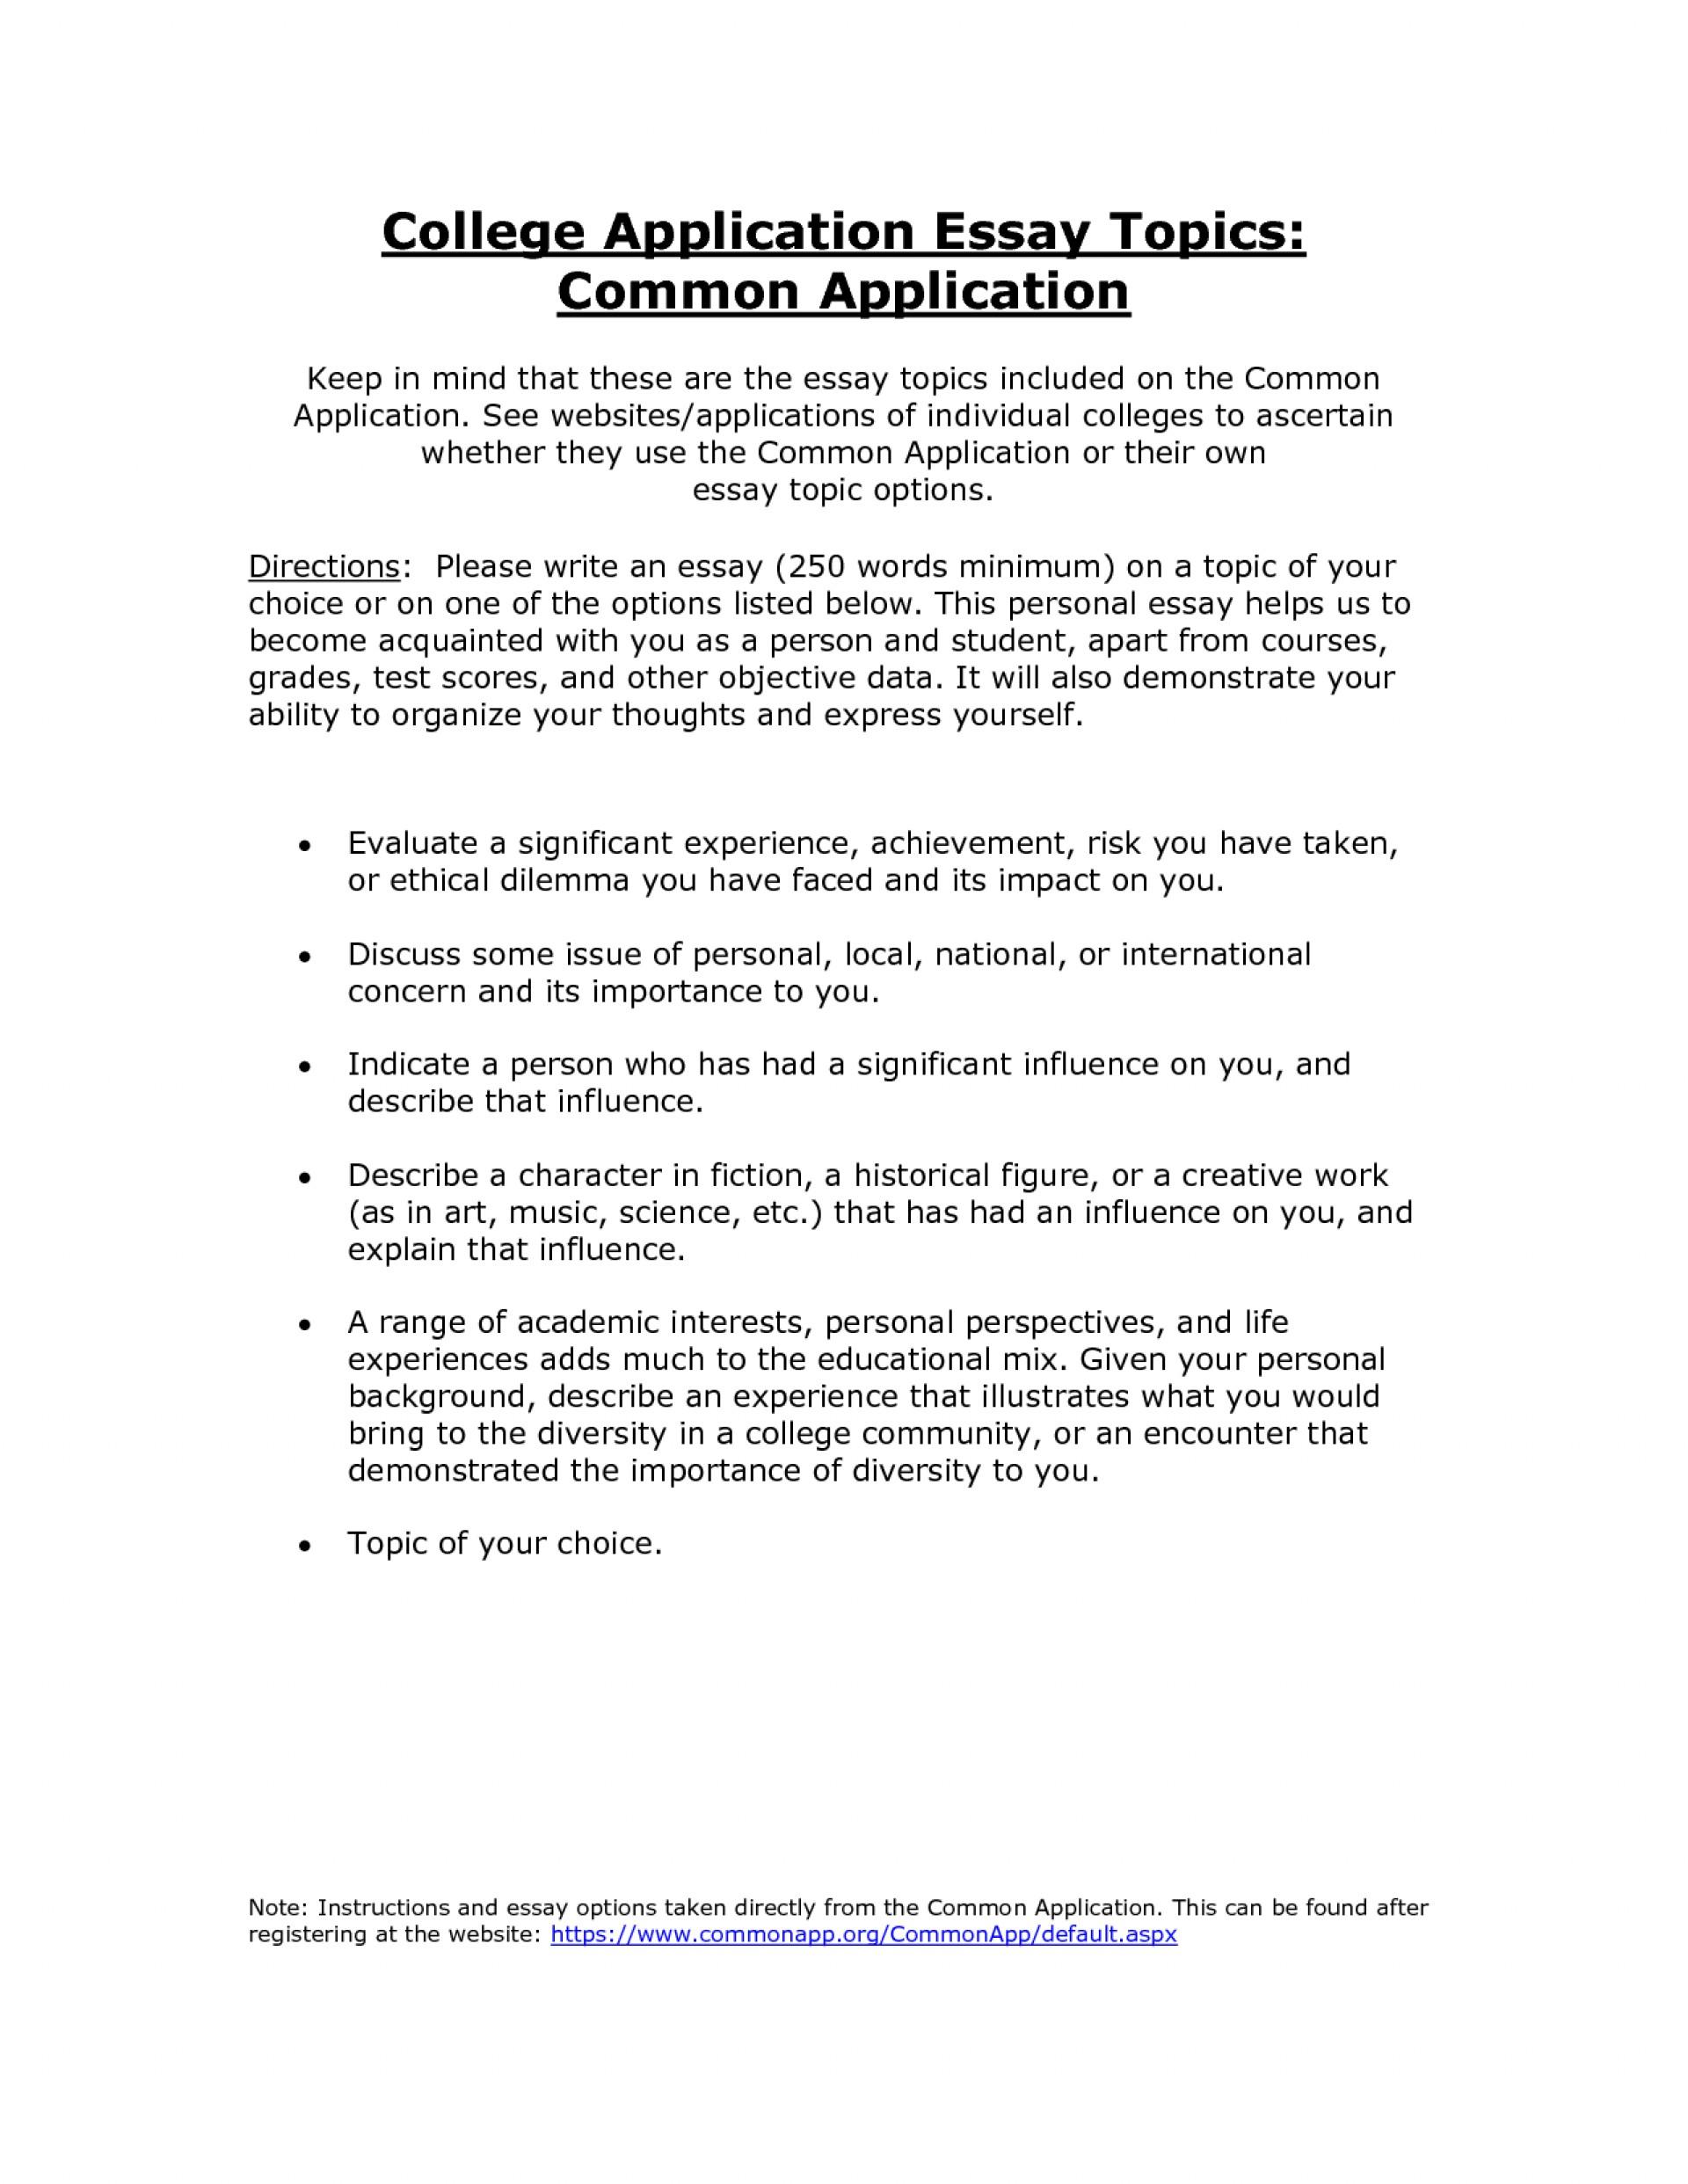 006 Vzmthii0b2 Common App Examples Best Example Essays Essay Samples Option 1 Prompt 2016 2017 1920